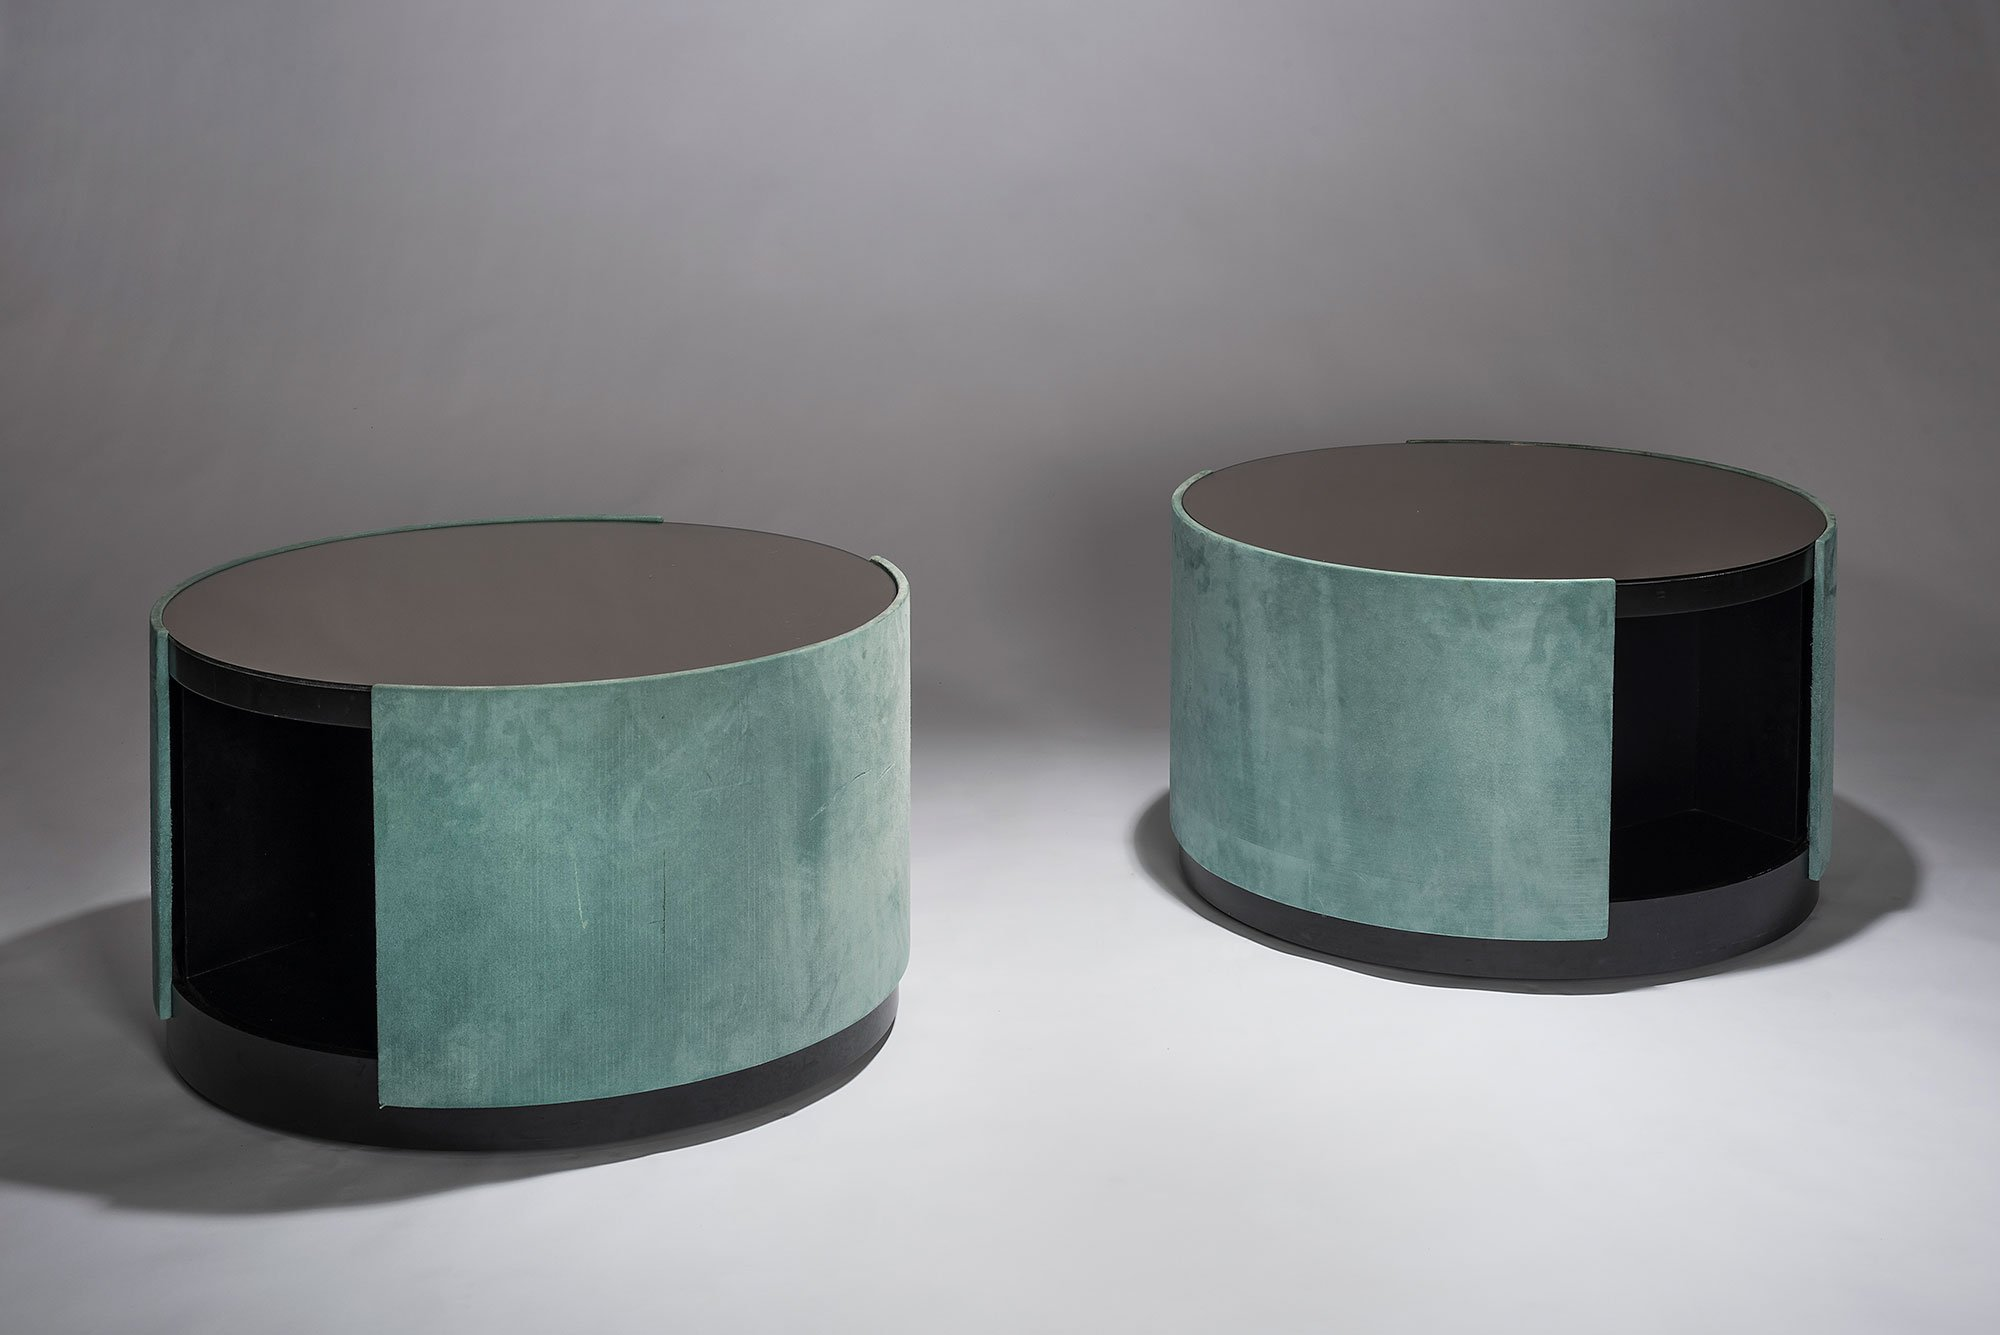 Osvaldo Borsani and Valeria Borsani  |                              Pair of unique occasional tables